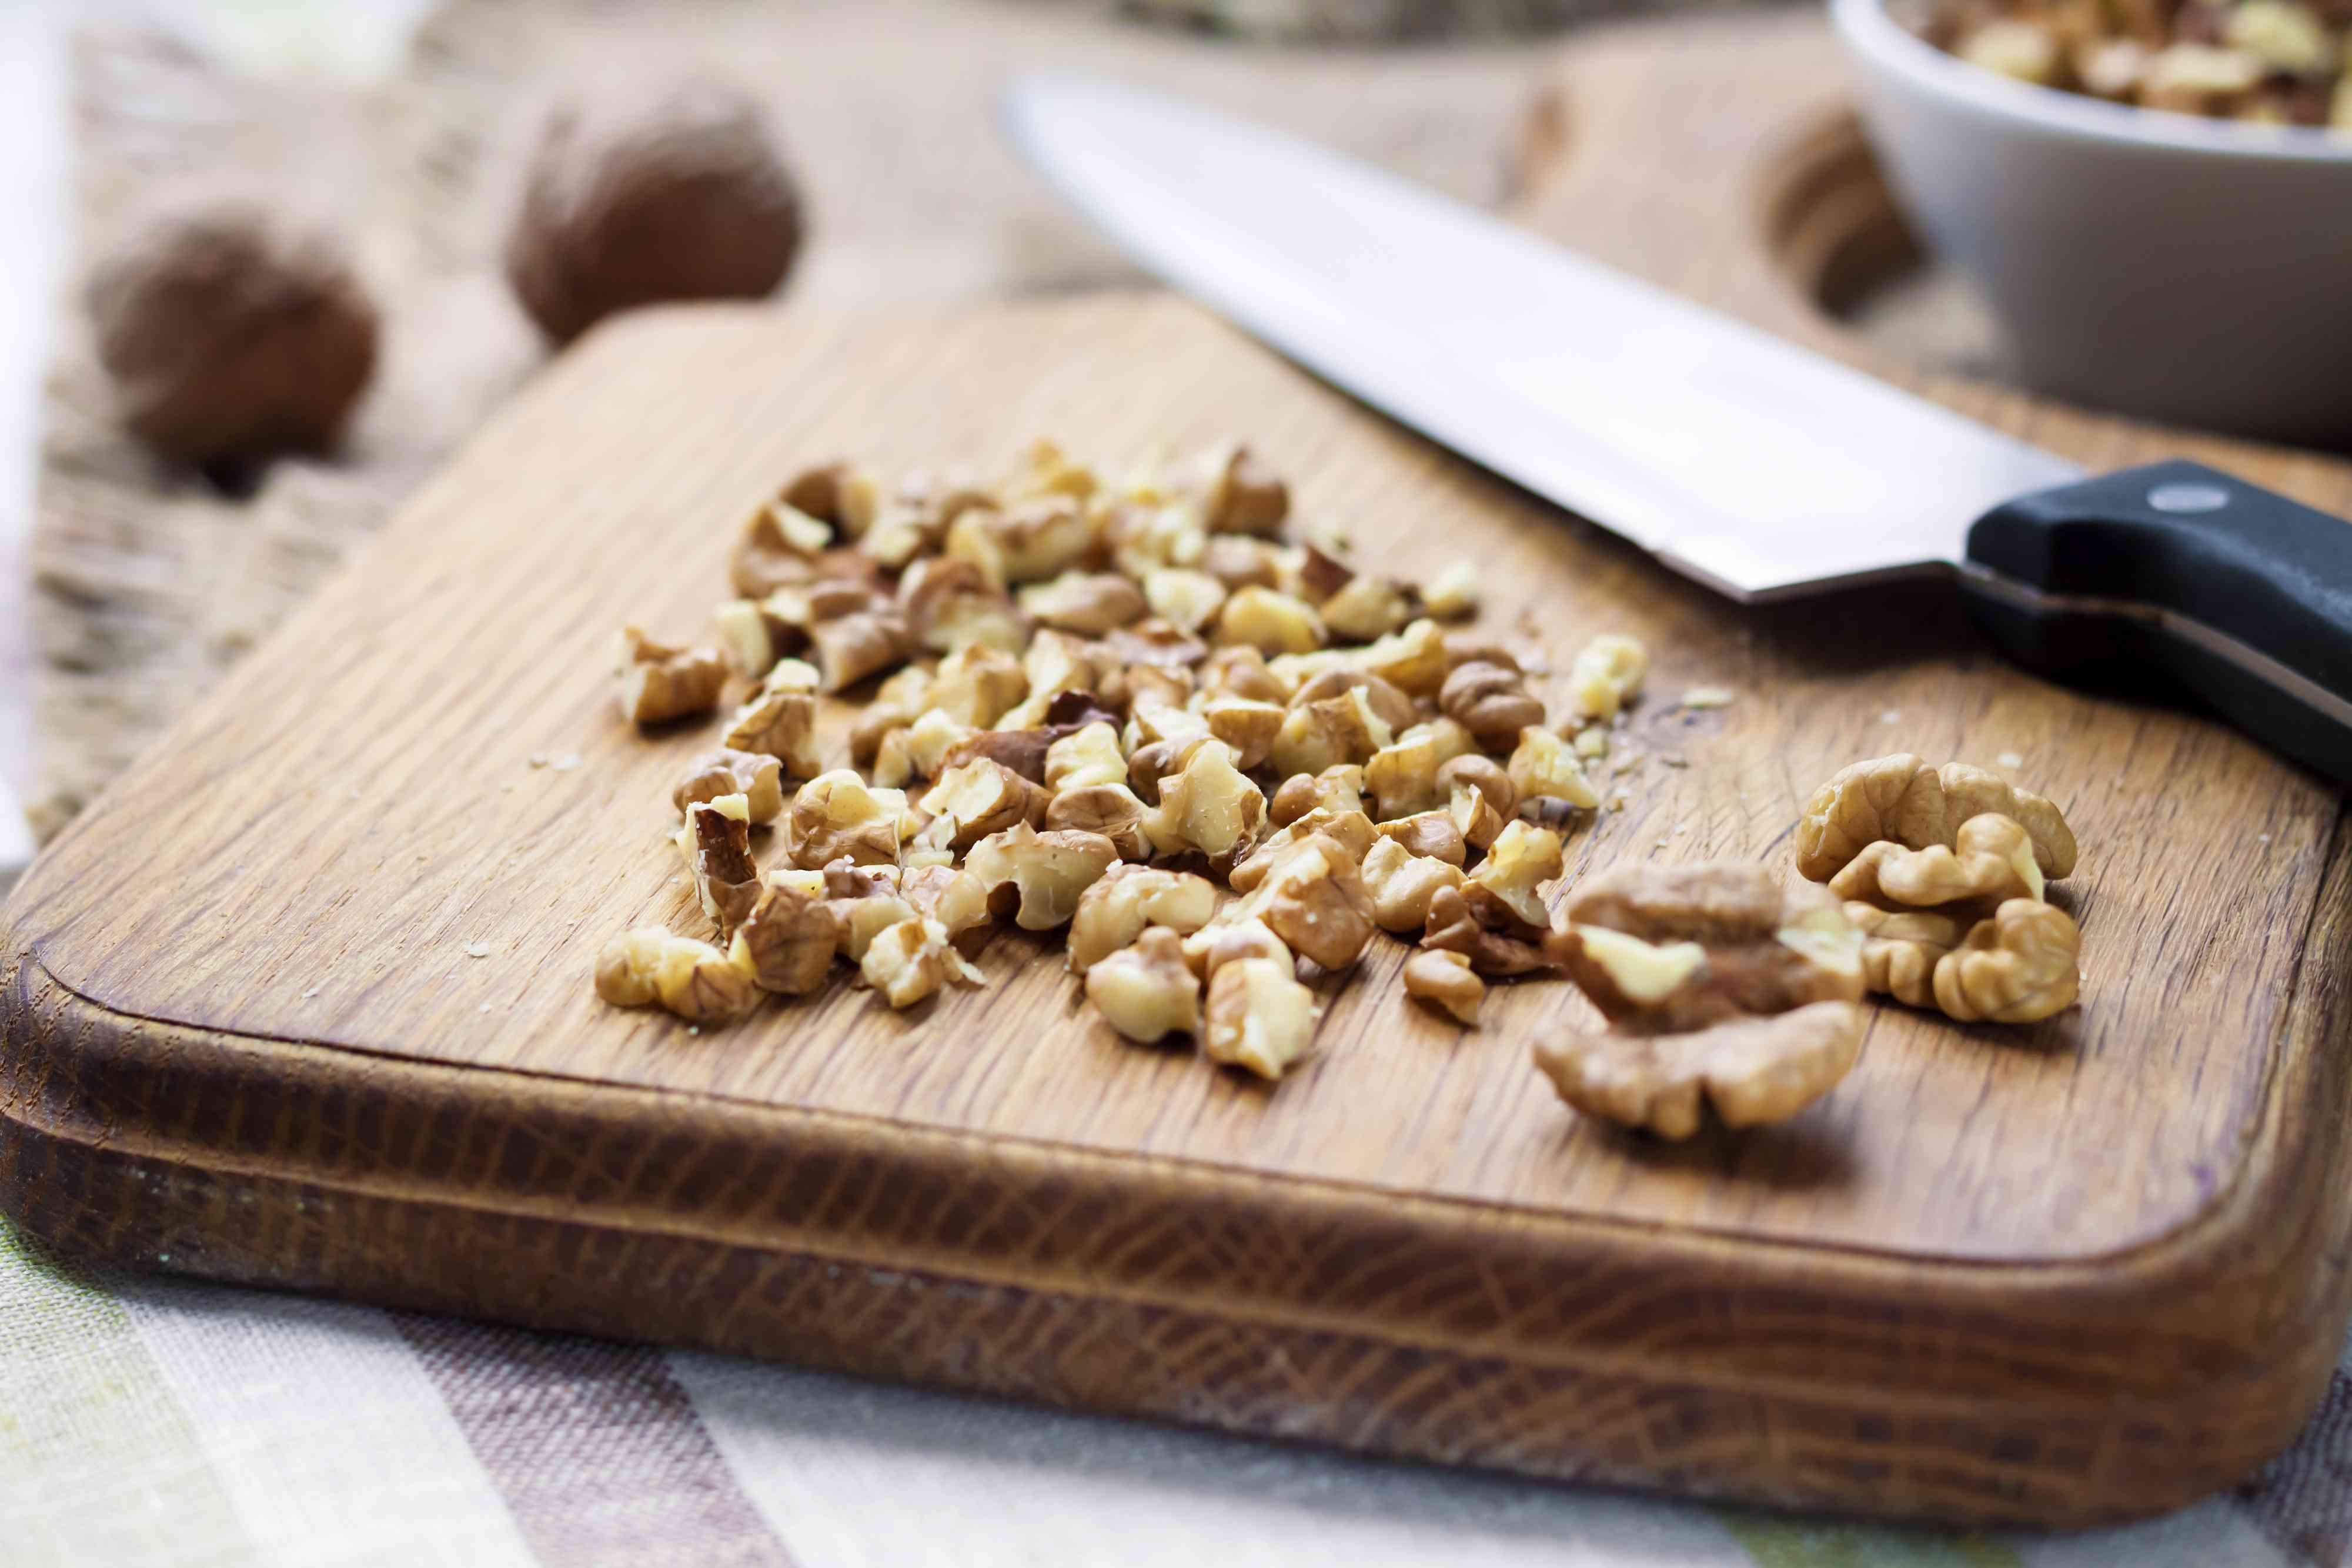 Chopped walnuts on wooden cutting board